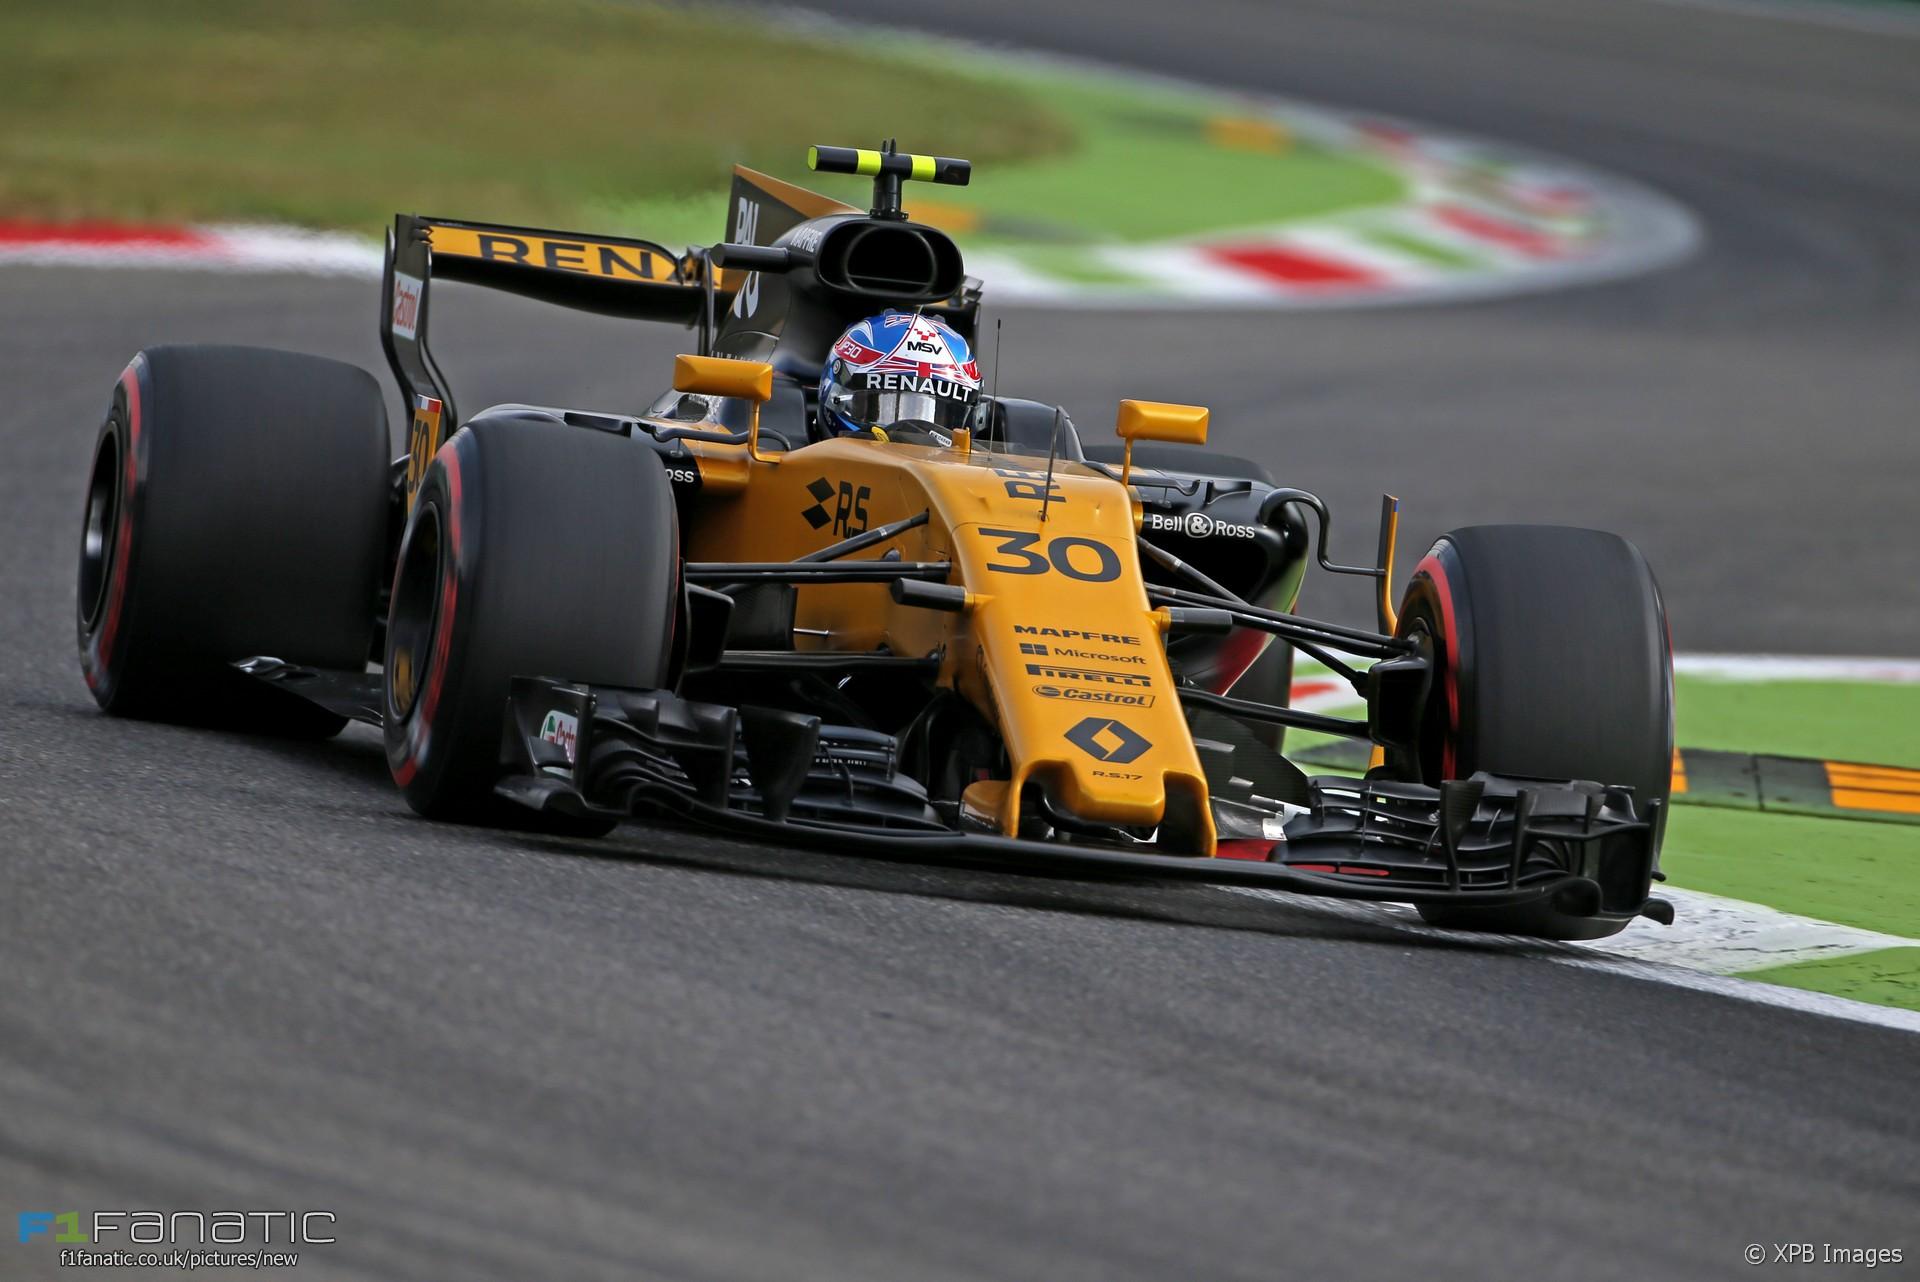 Jolyon Palmer, Renault, Monza, 2017 · F1 Fanatic